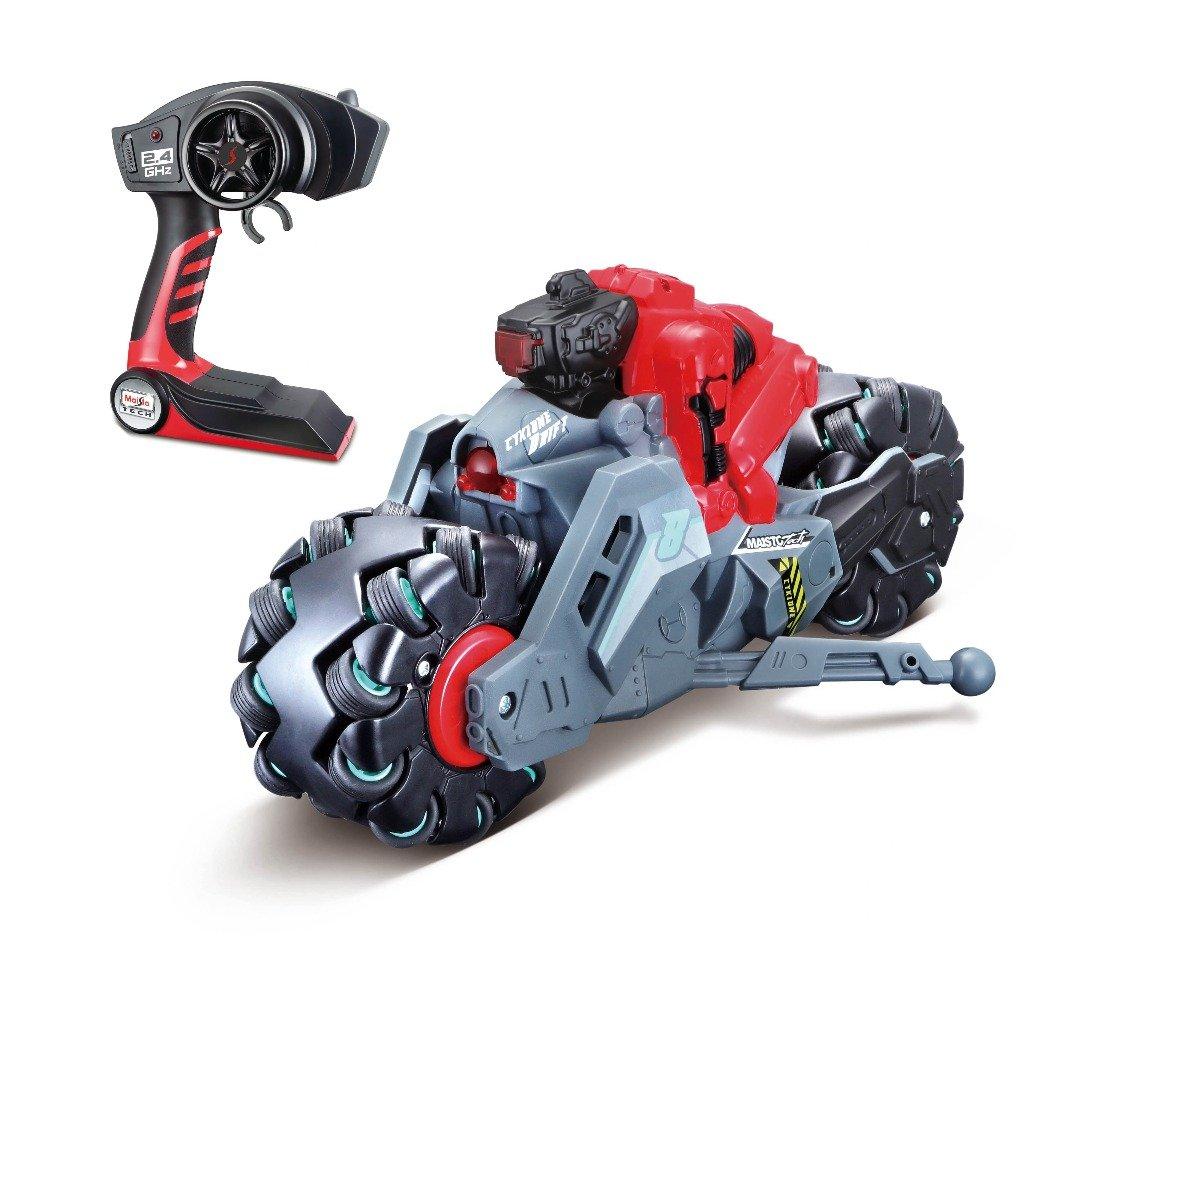 Motocicleta cu telecomanda Maisto Cyklone Drift